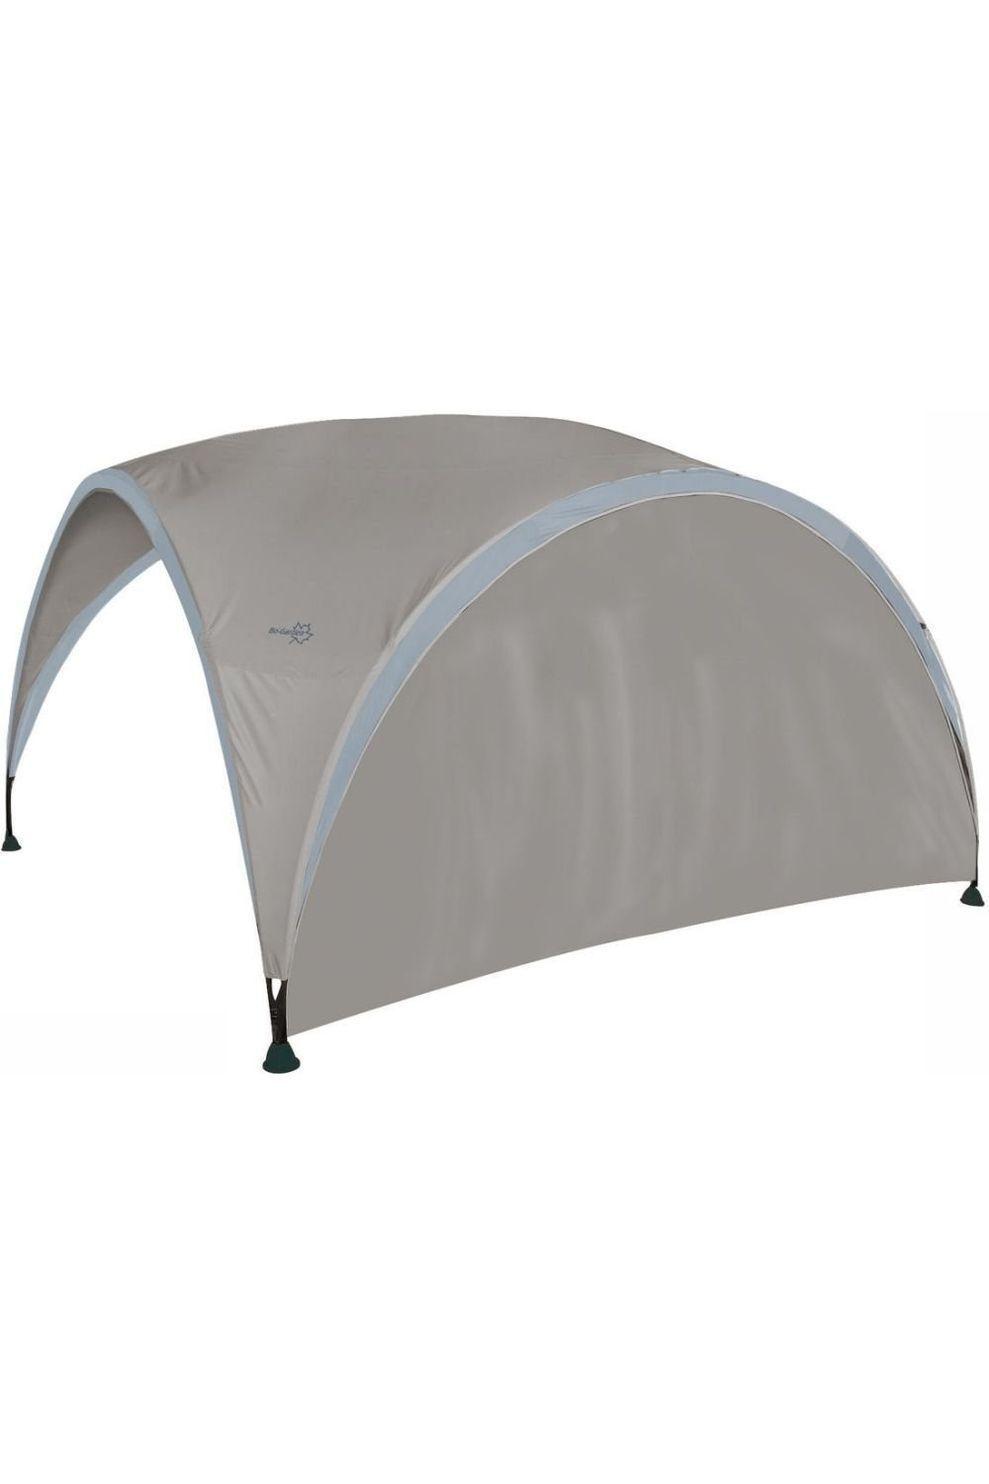 Bo-Garden Tarps Zijwand Voor Party Shelter Medium - - Transparant